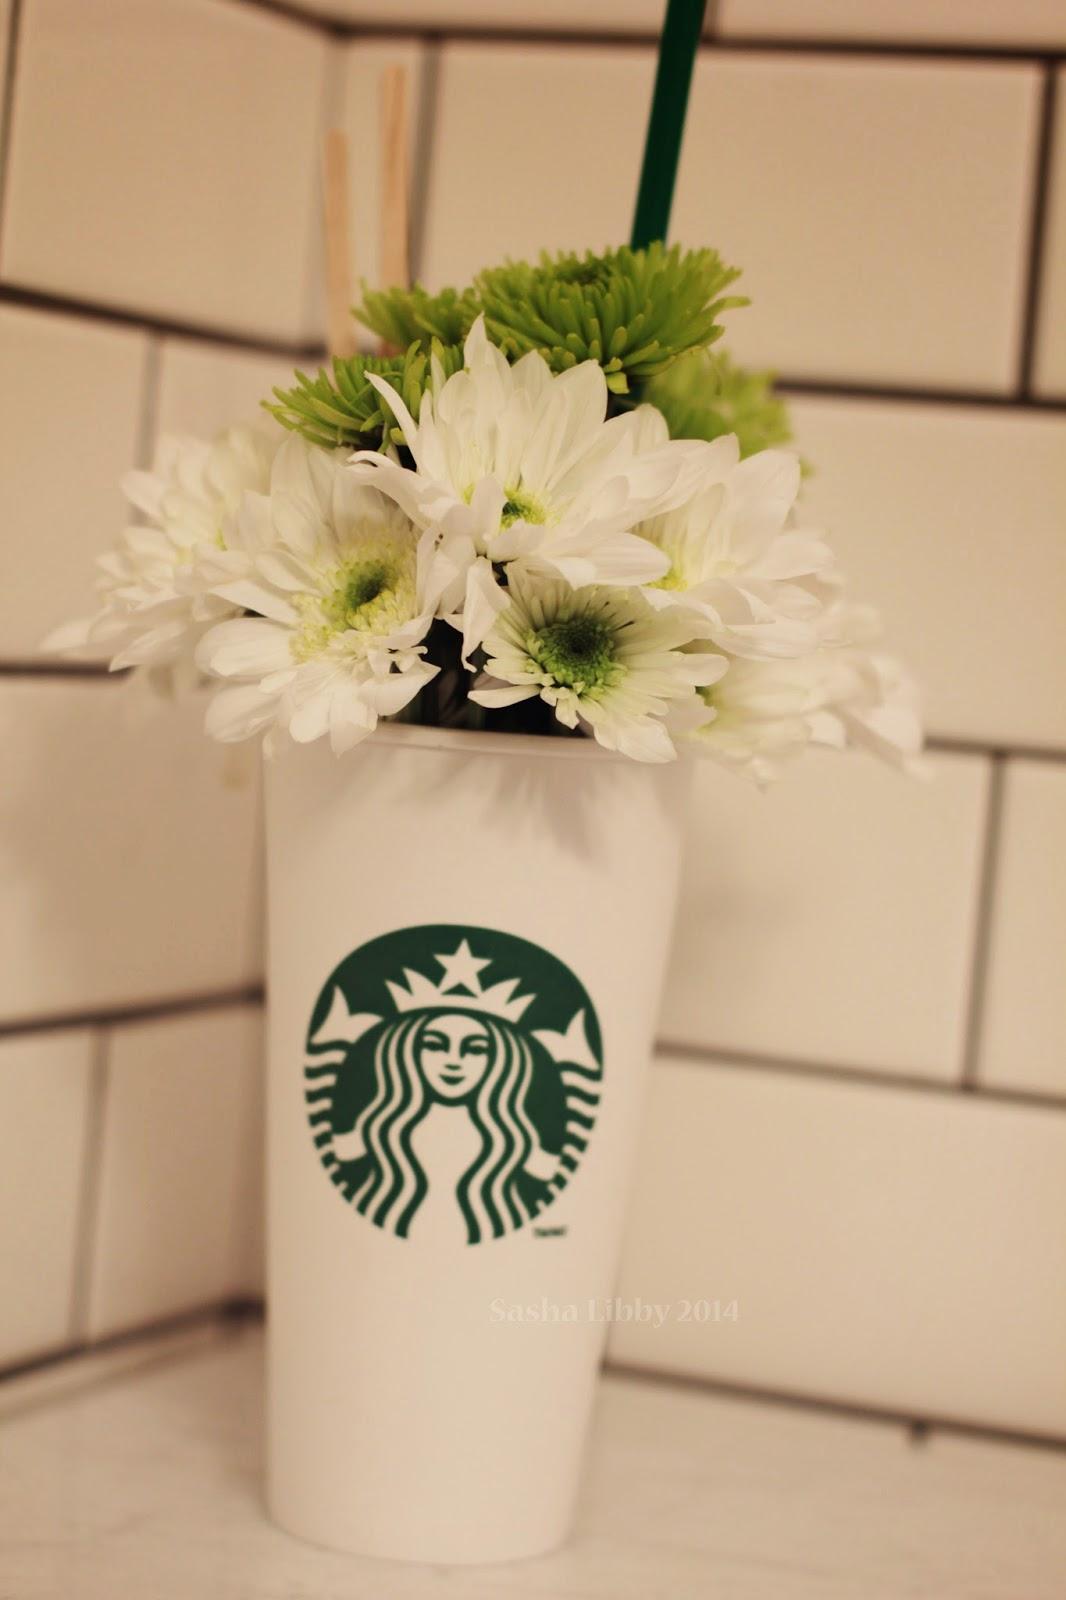 Starbucks+flower+arrangement